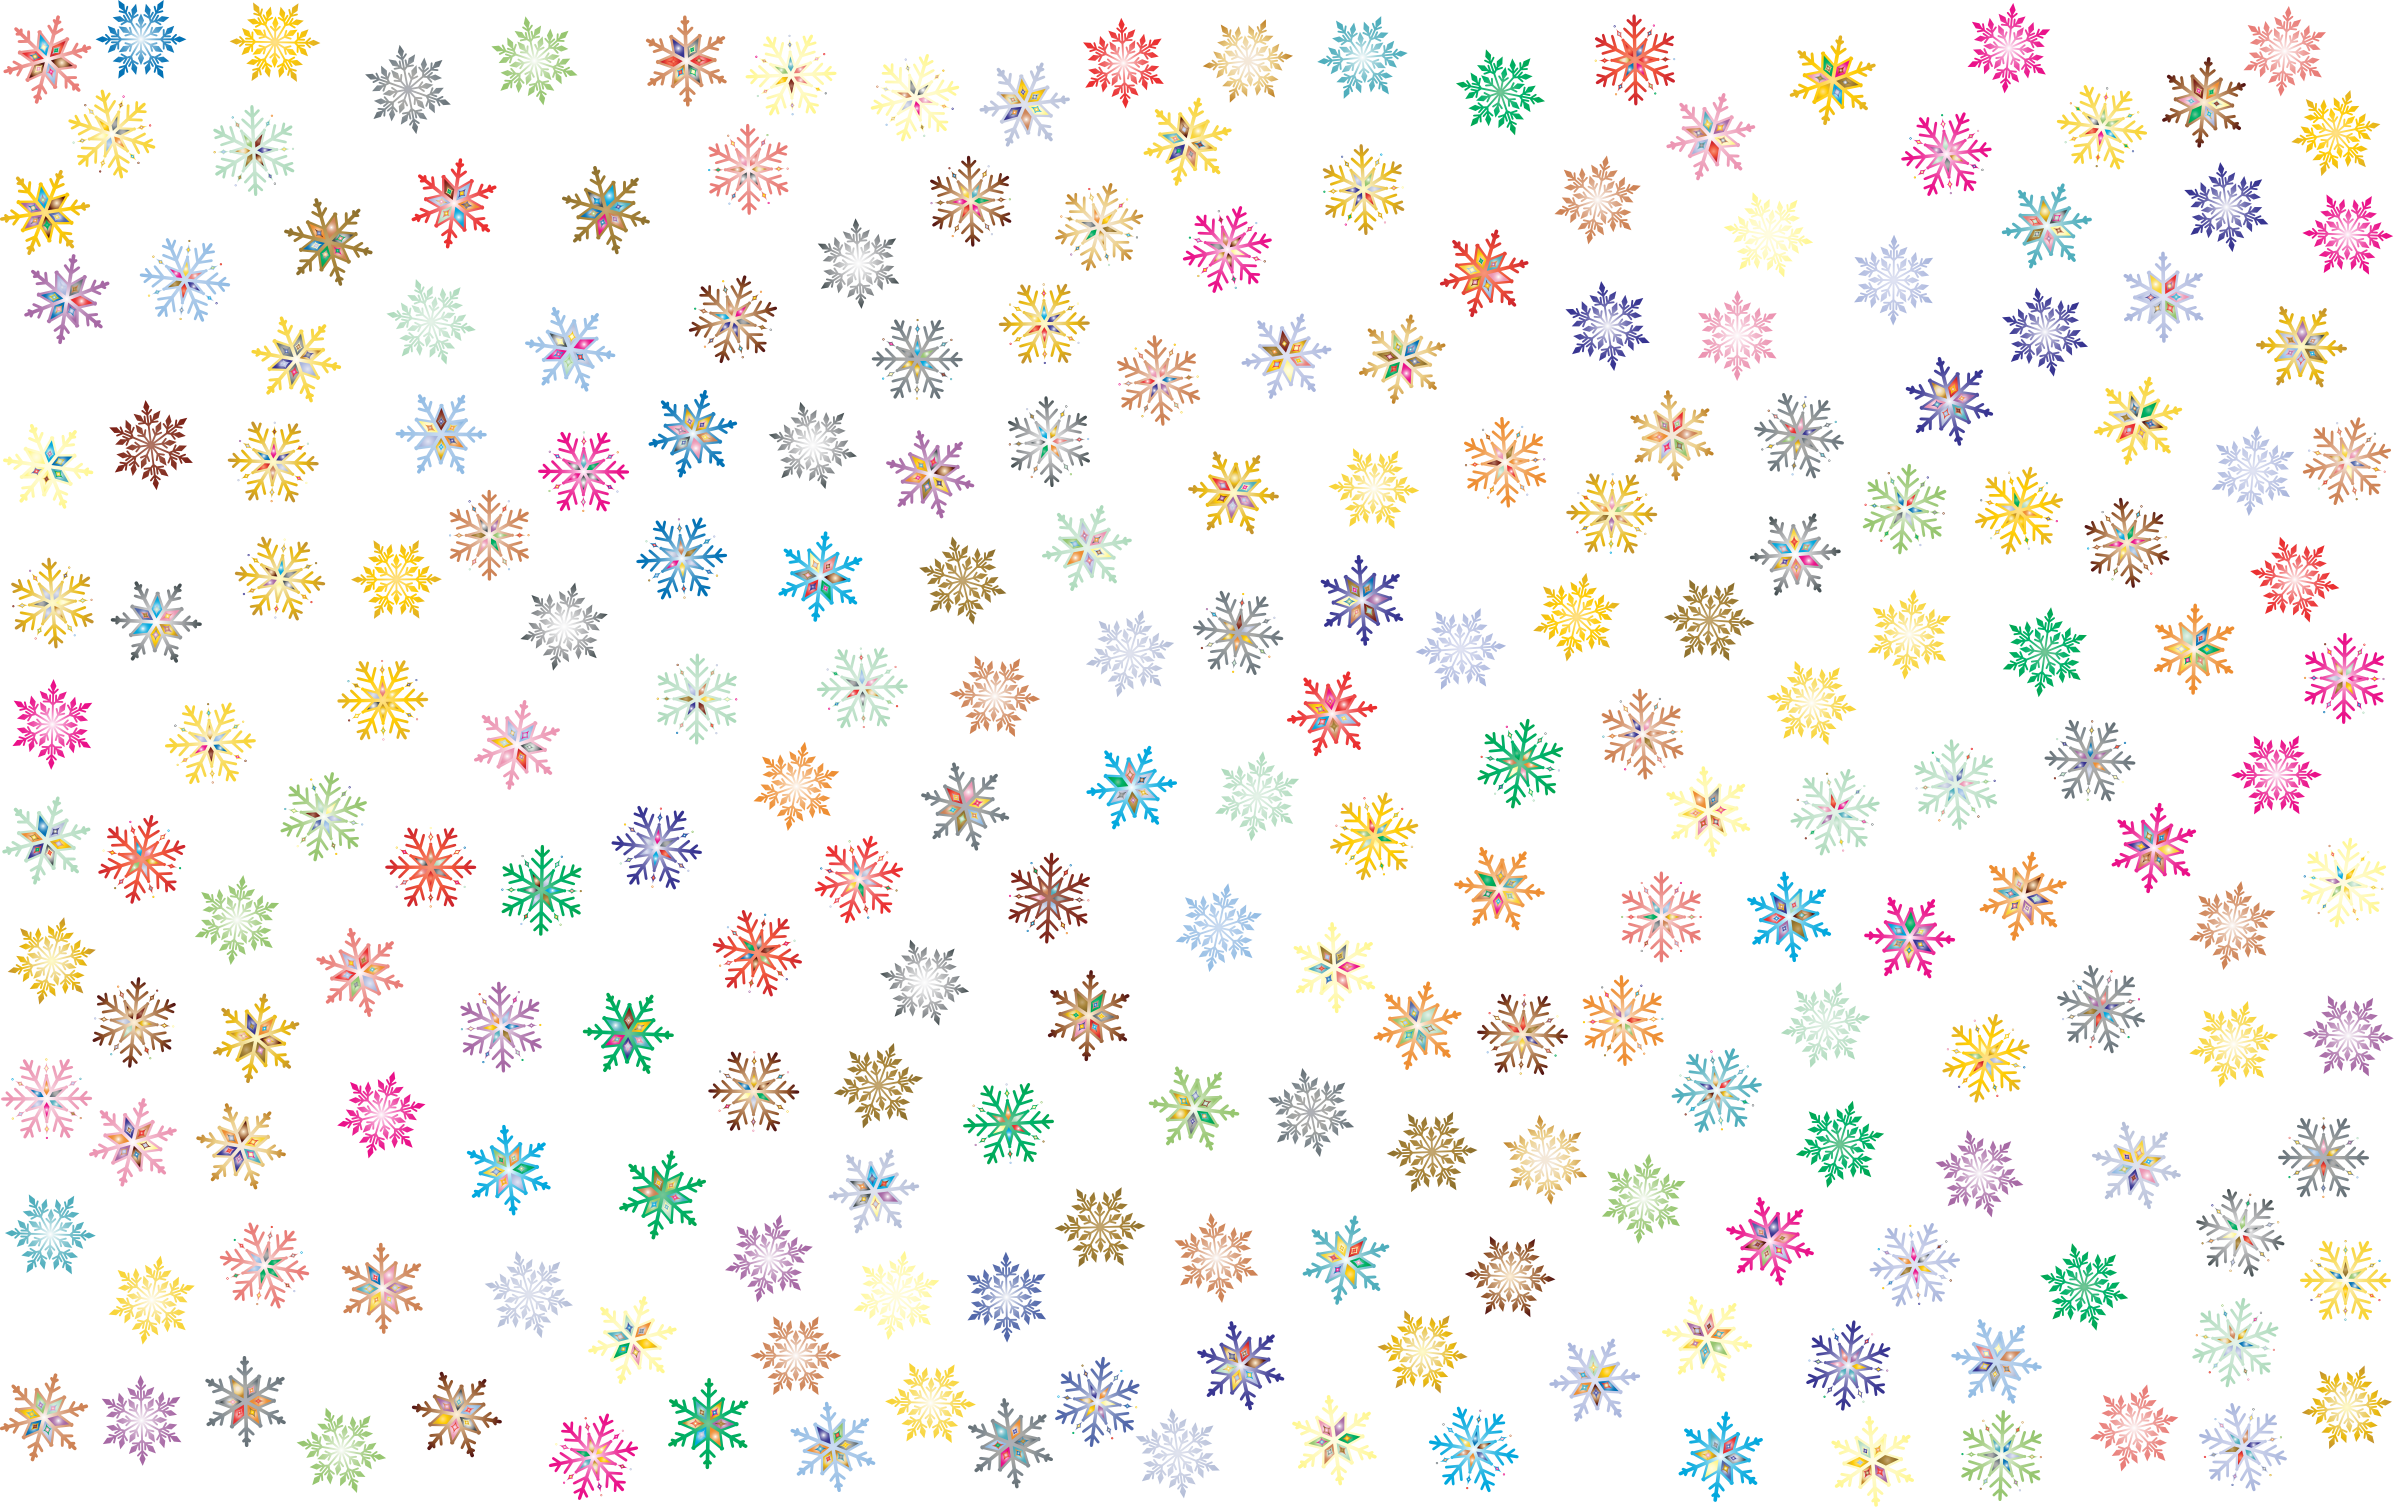 Png snowflakes background impremedia